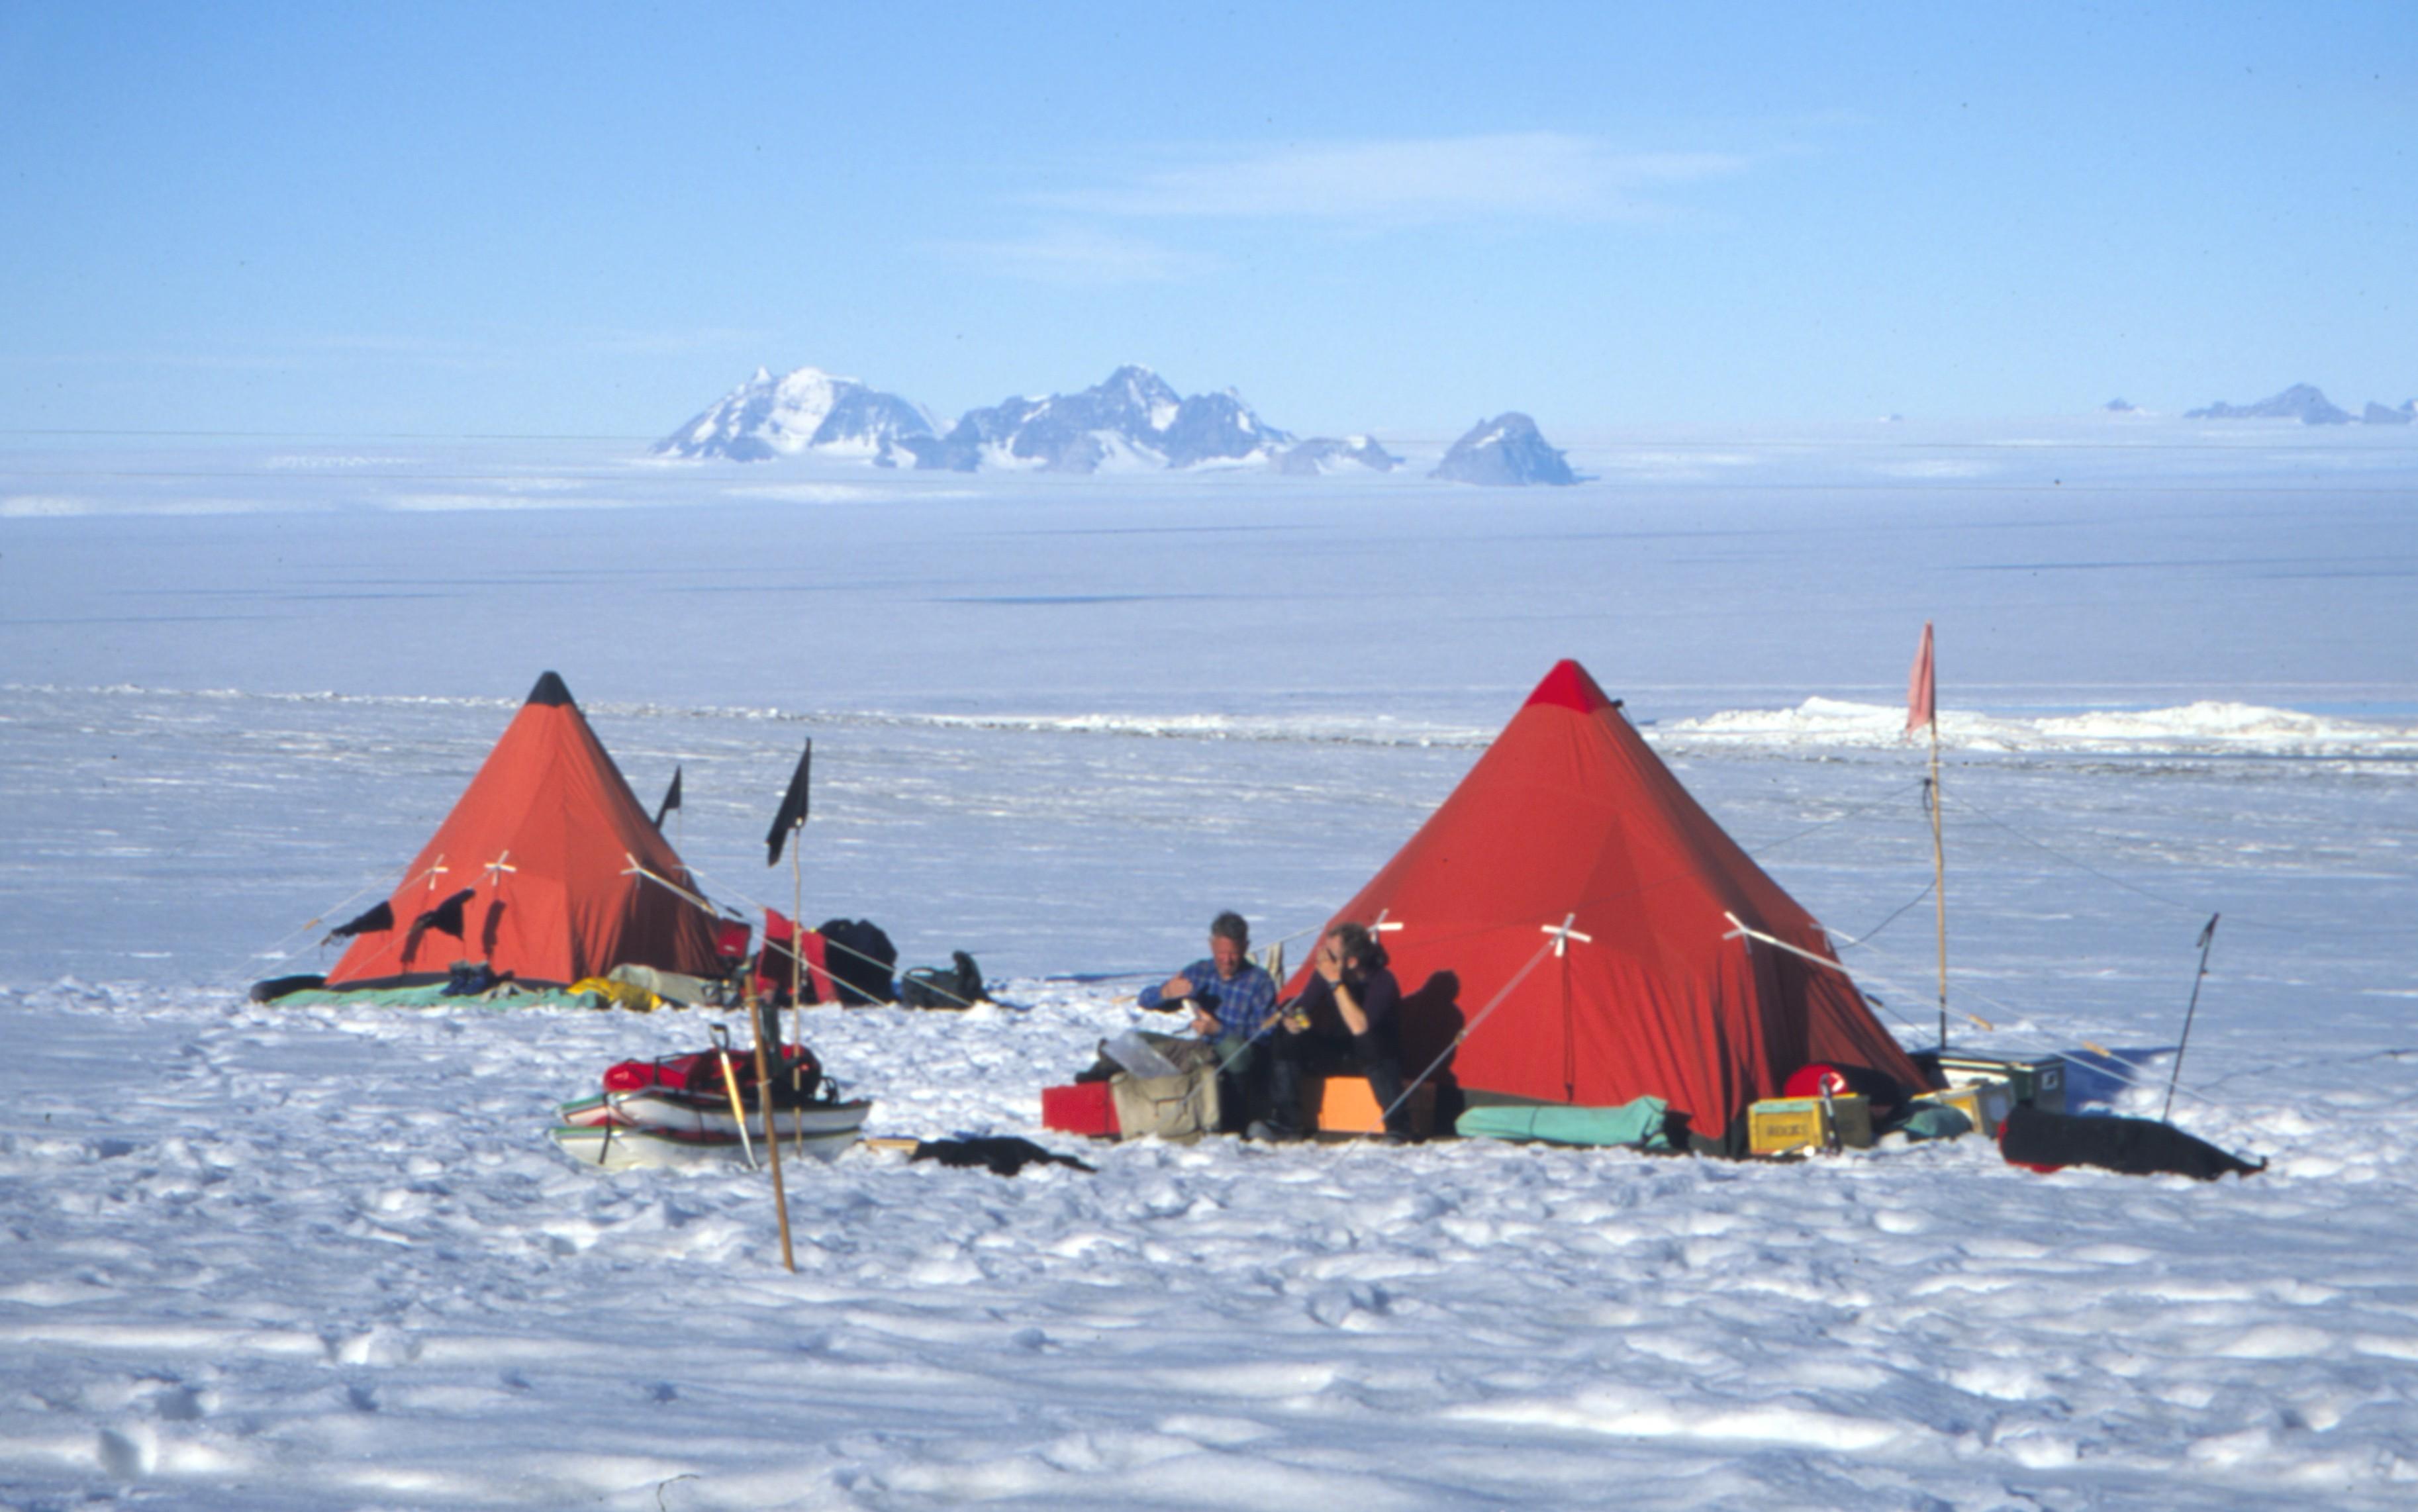 Остров Александра Антарктида VP8DMH/P